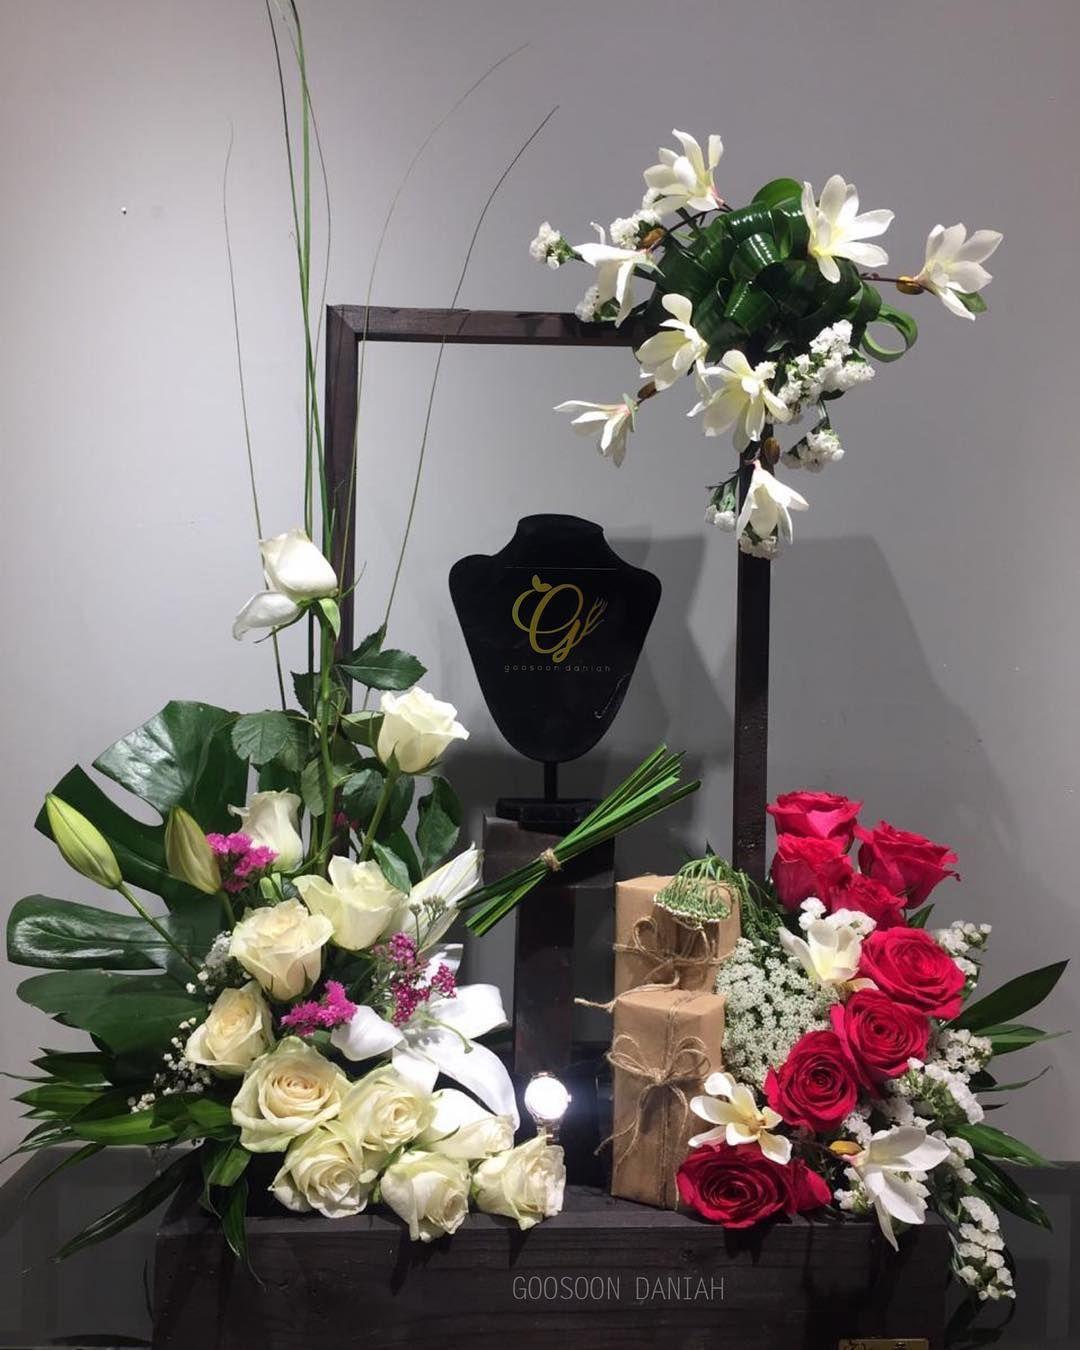 ديزاين شبكة بوتيك غصون دانيه Goosoon Daniah Boutique خميس مشيط حي الضيافة طريق الامام محمد بن ديزاين شبكة بوتيك غصون دانيه Goos Floral Wreath Floral Decor